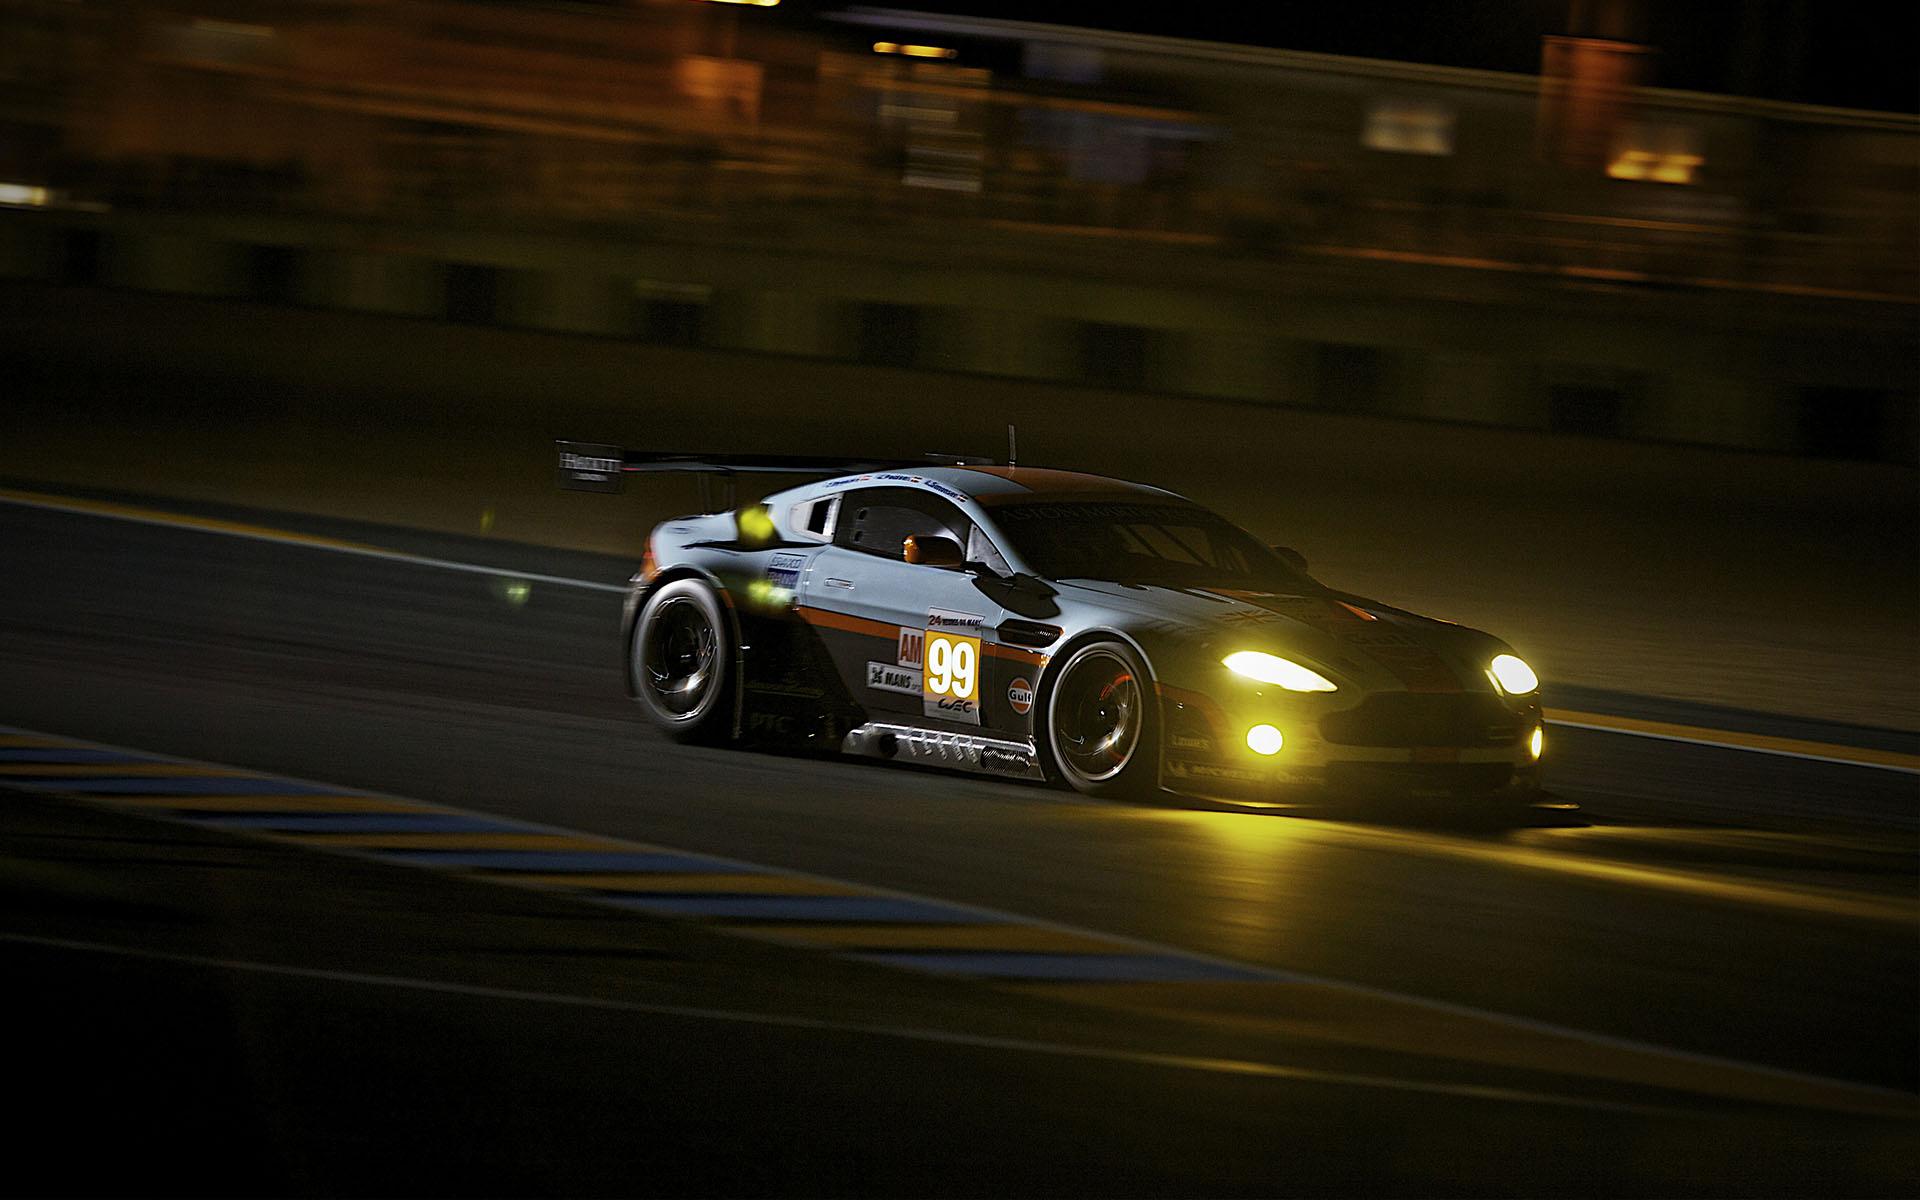 Aston Martin Vantage Night Race Wallpaper Hd Car Wallpapers Id 2816